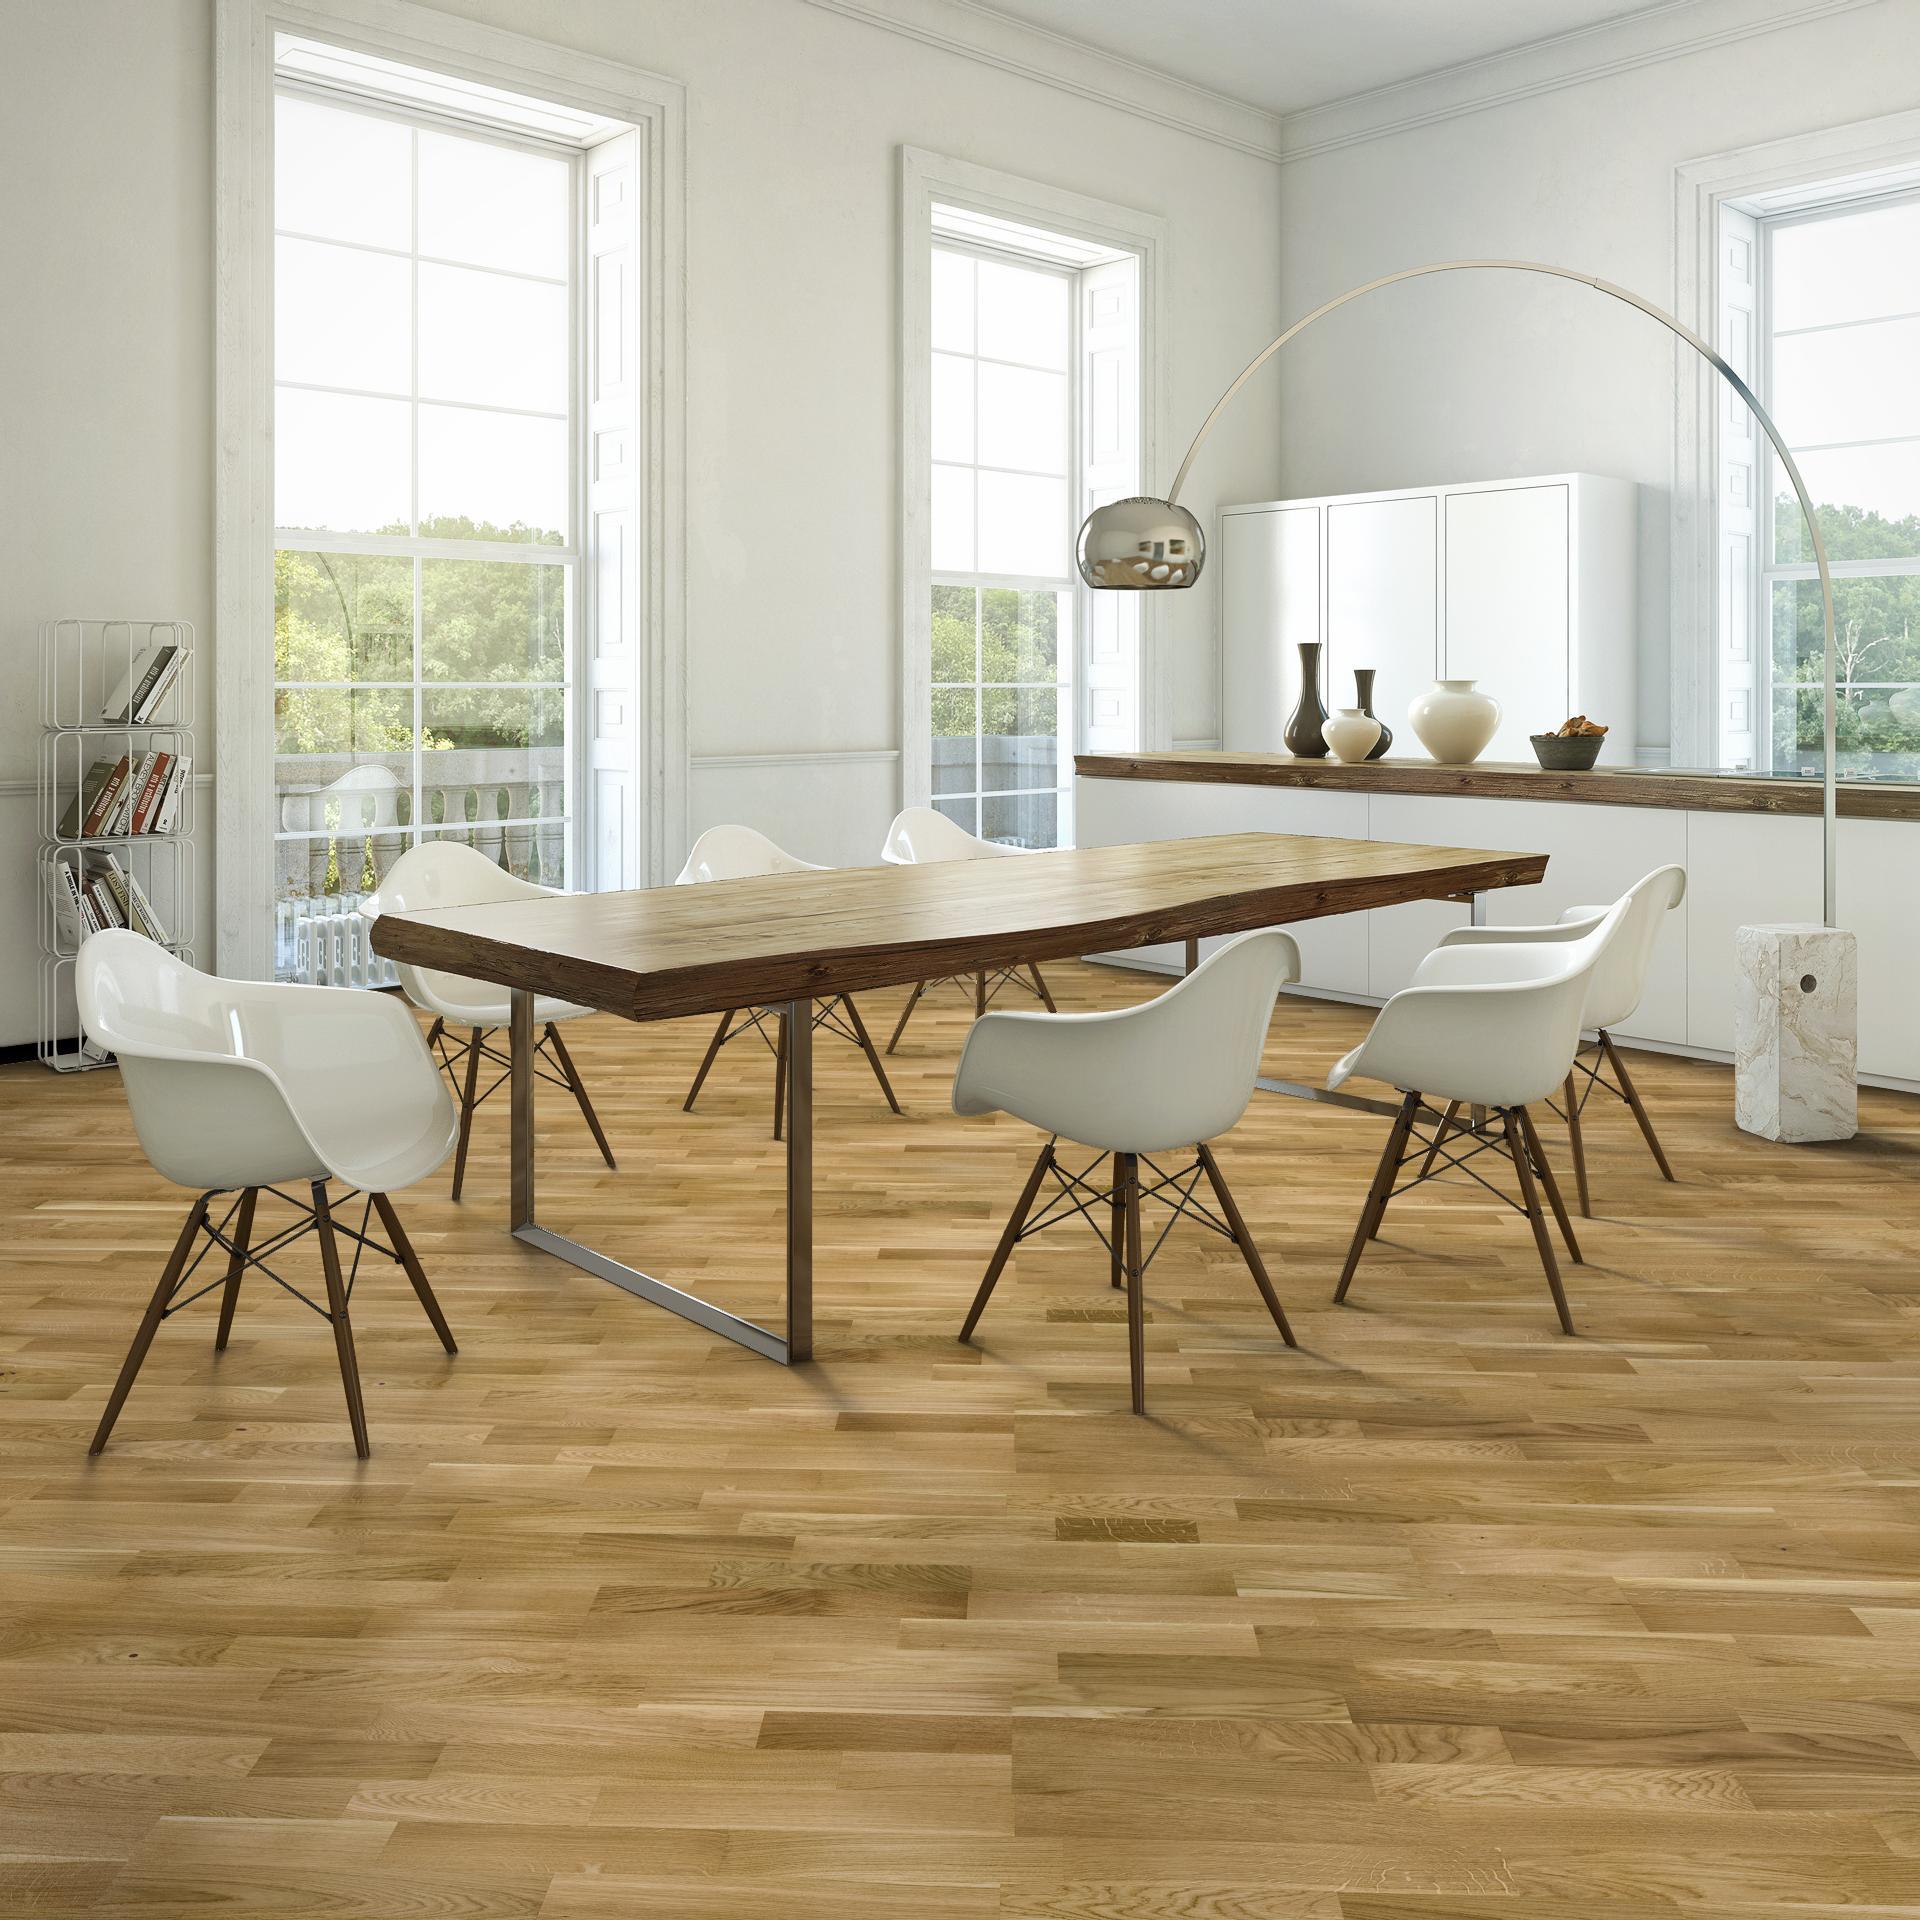 Podloga drewniana inspiracje 15